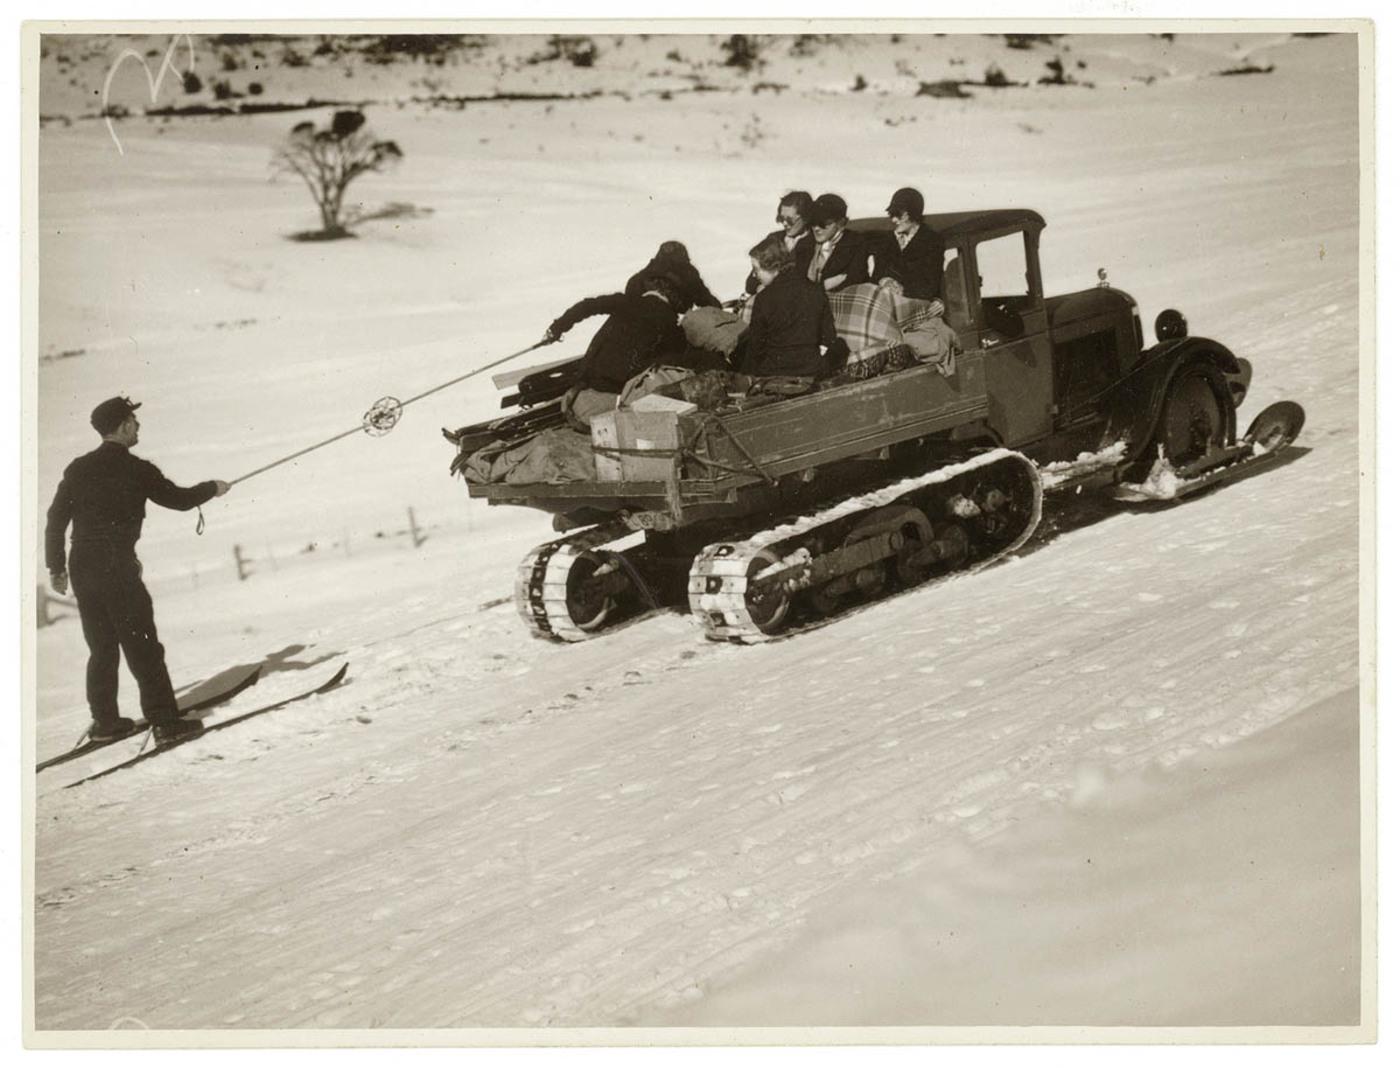 Truck with caterpillar tread pulls skier through the snow, Kosciusko, 193- / photographer Sam Hood